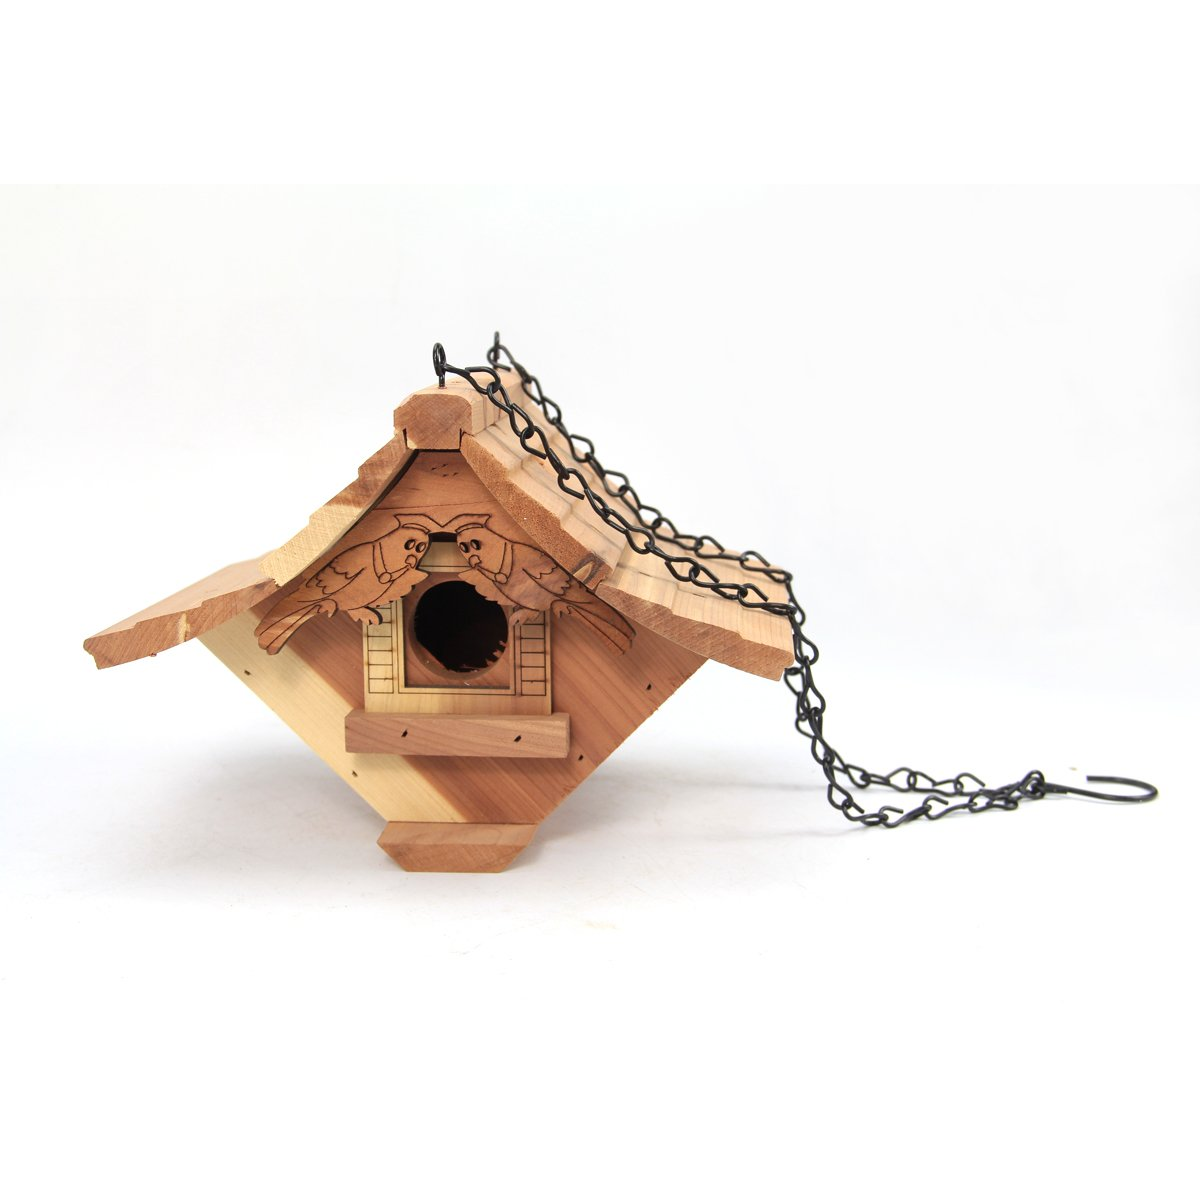 Worth Garden Cedar Wooden Bird House with Hand Cerving Bird Décor Gate